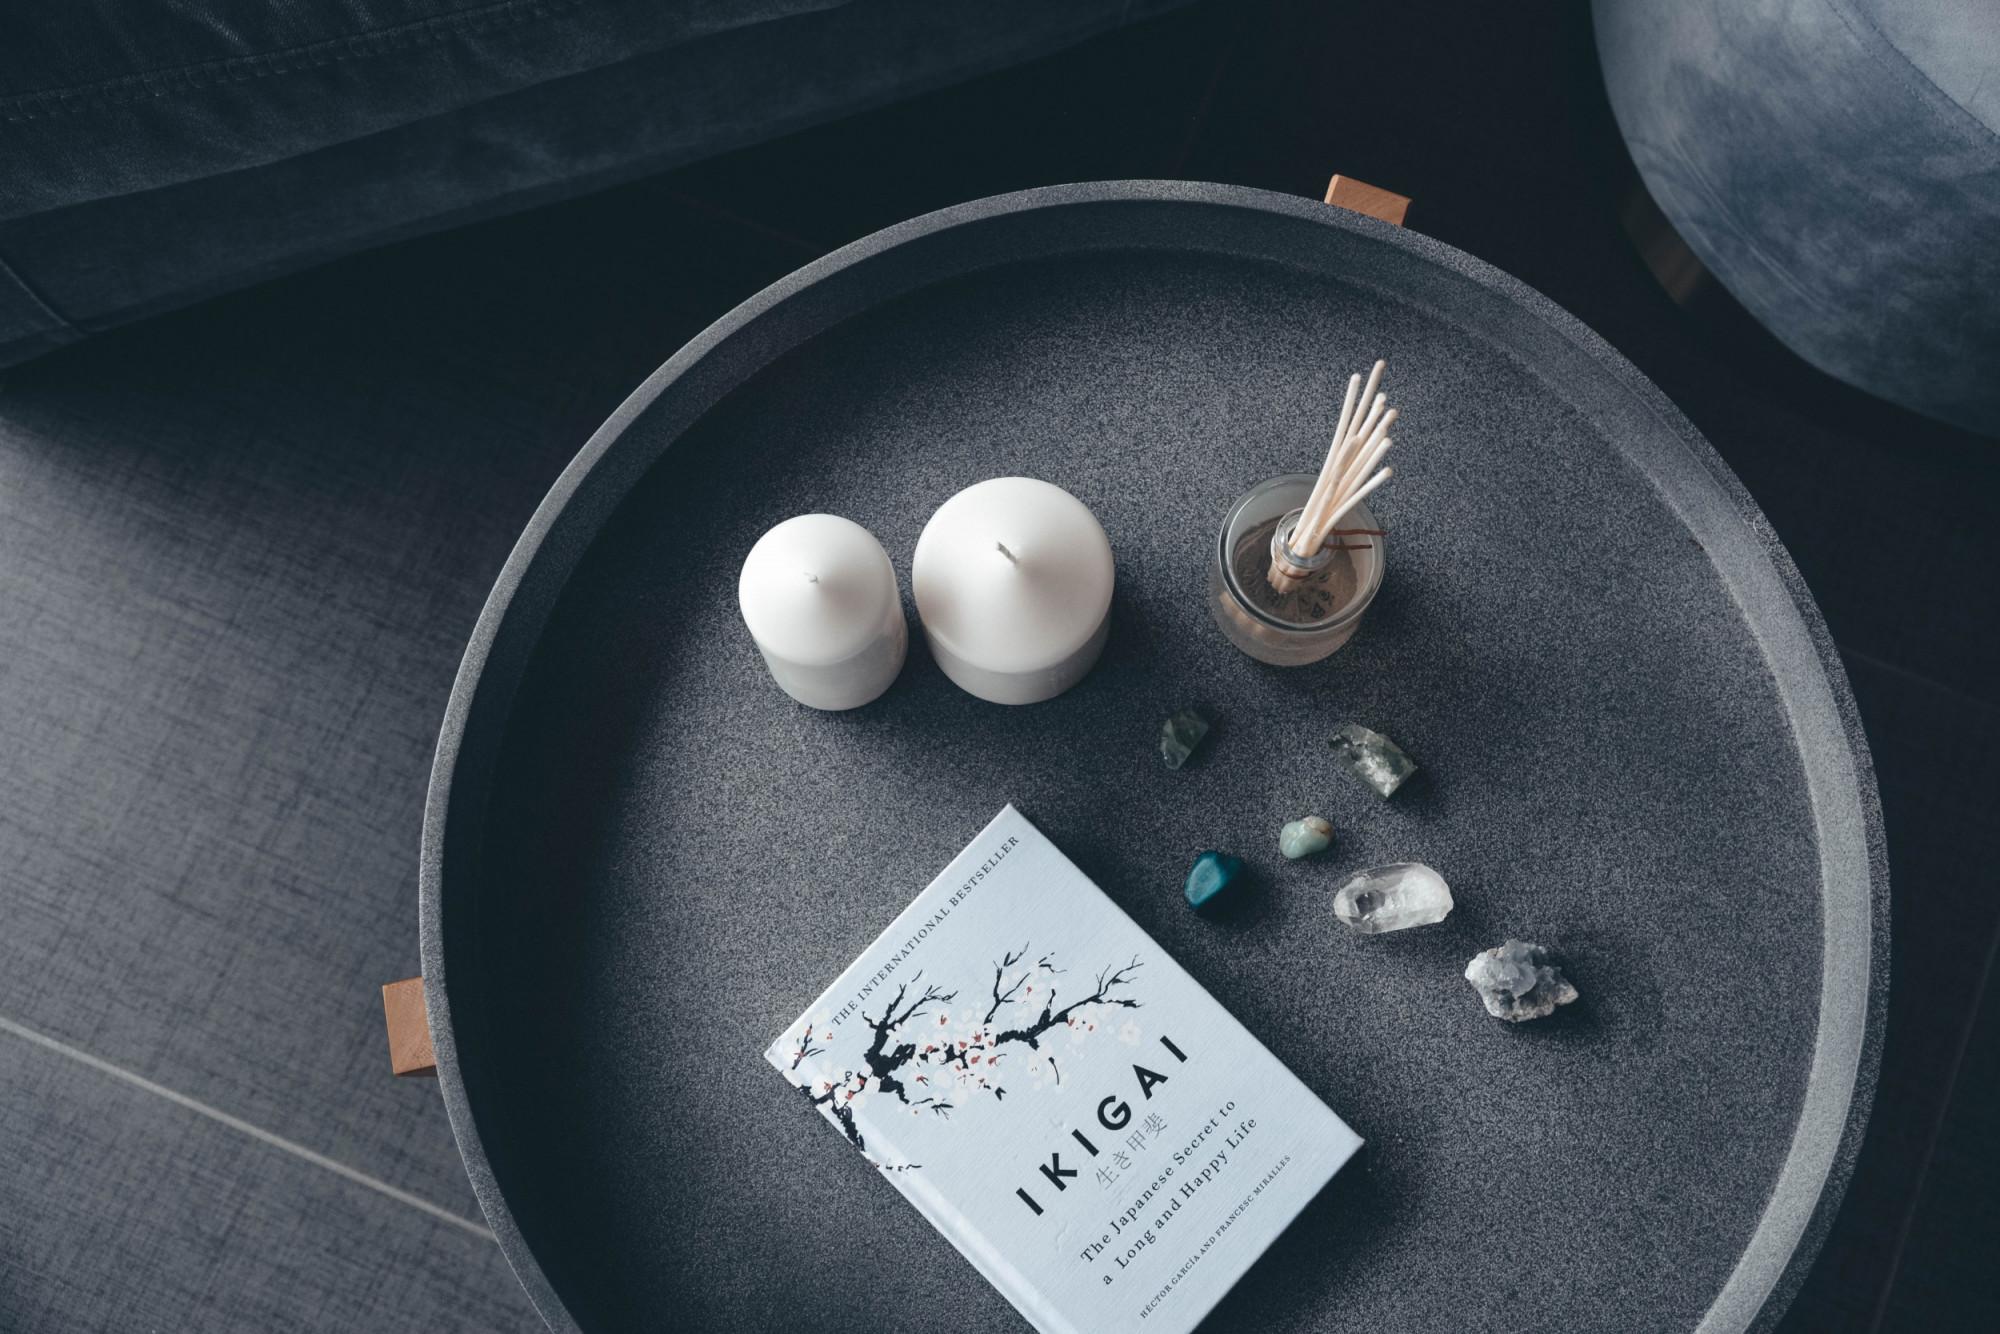 Ikigai book on table